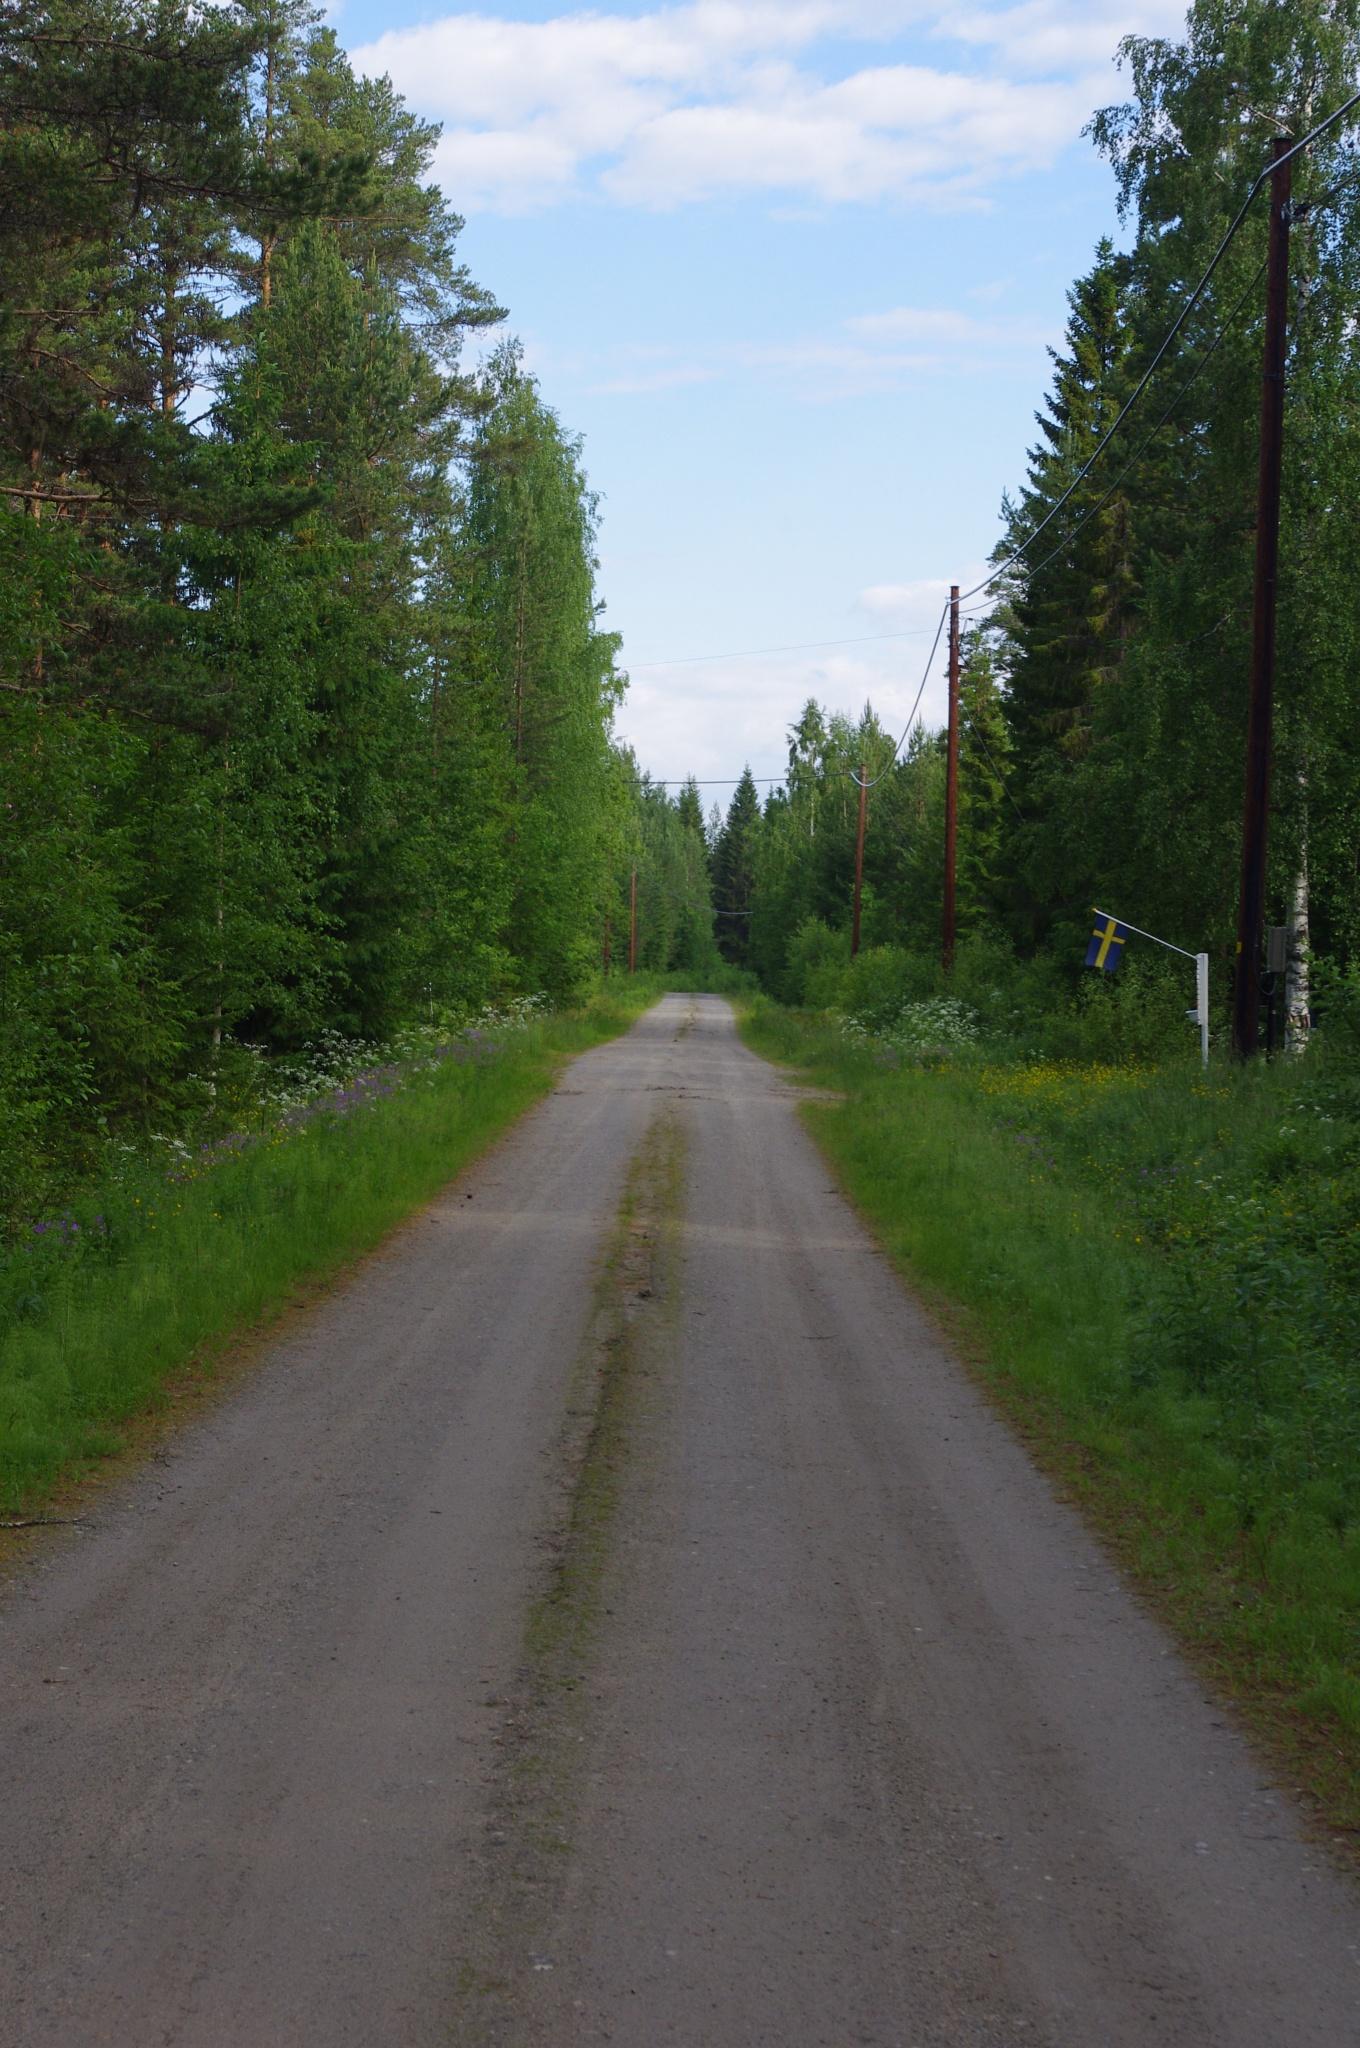 Forestroad by eva.e.mabrouk